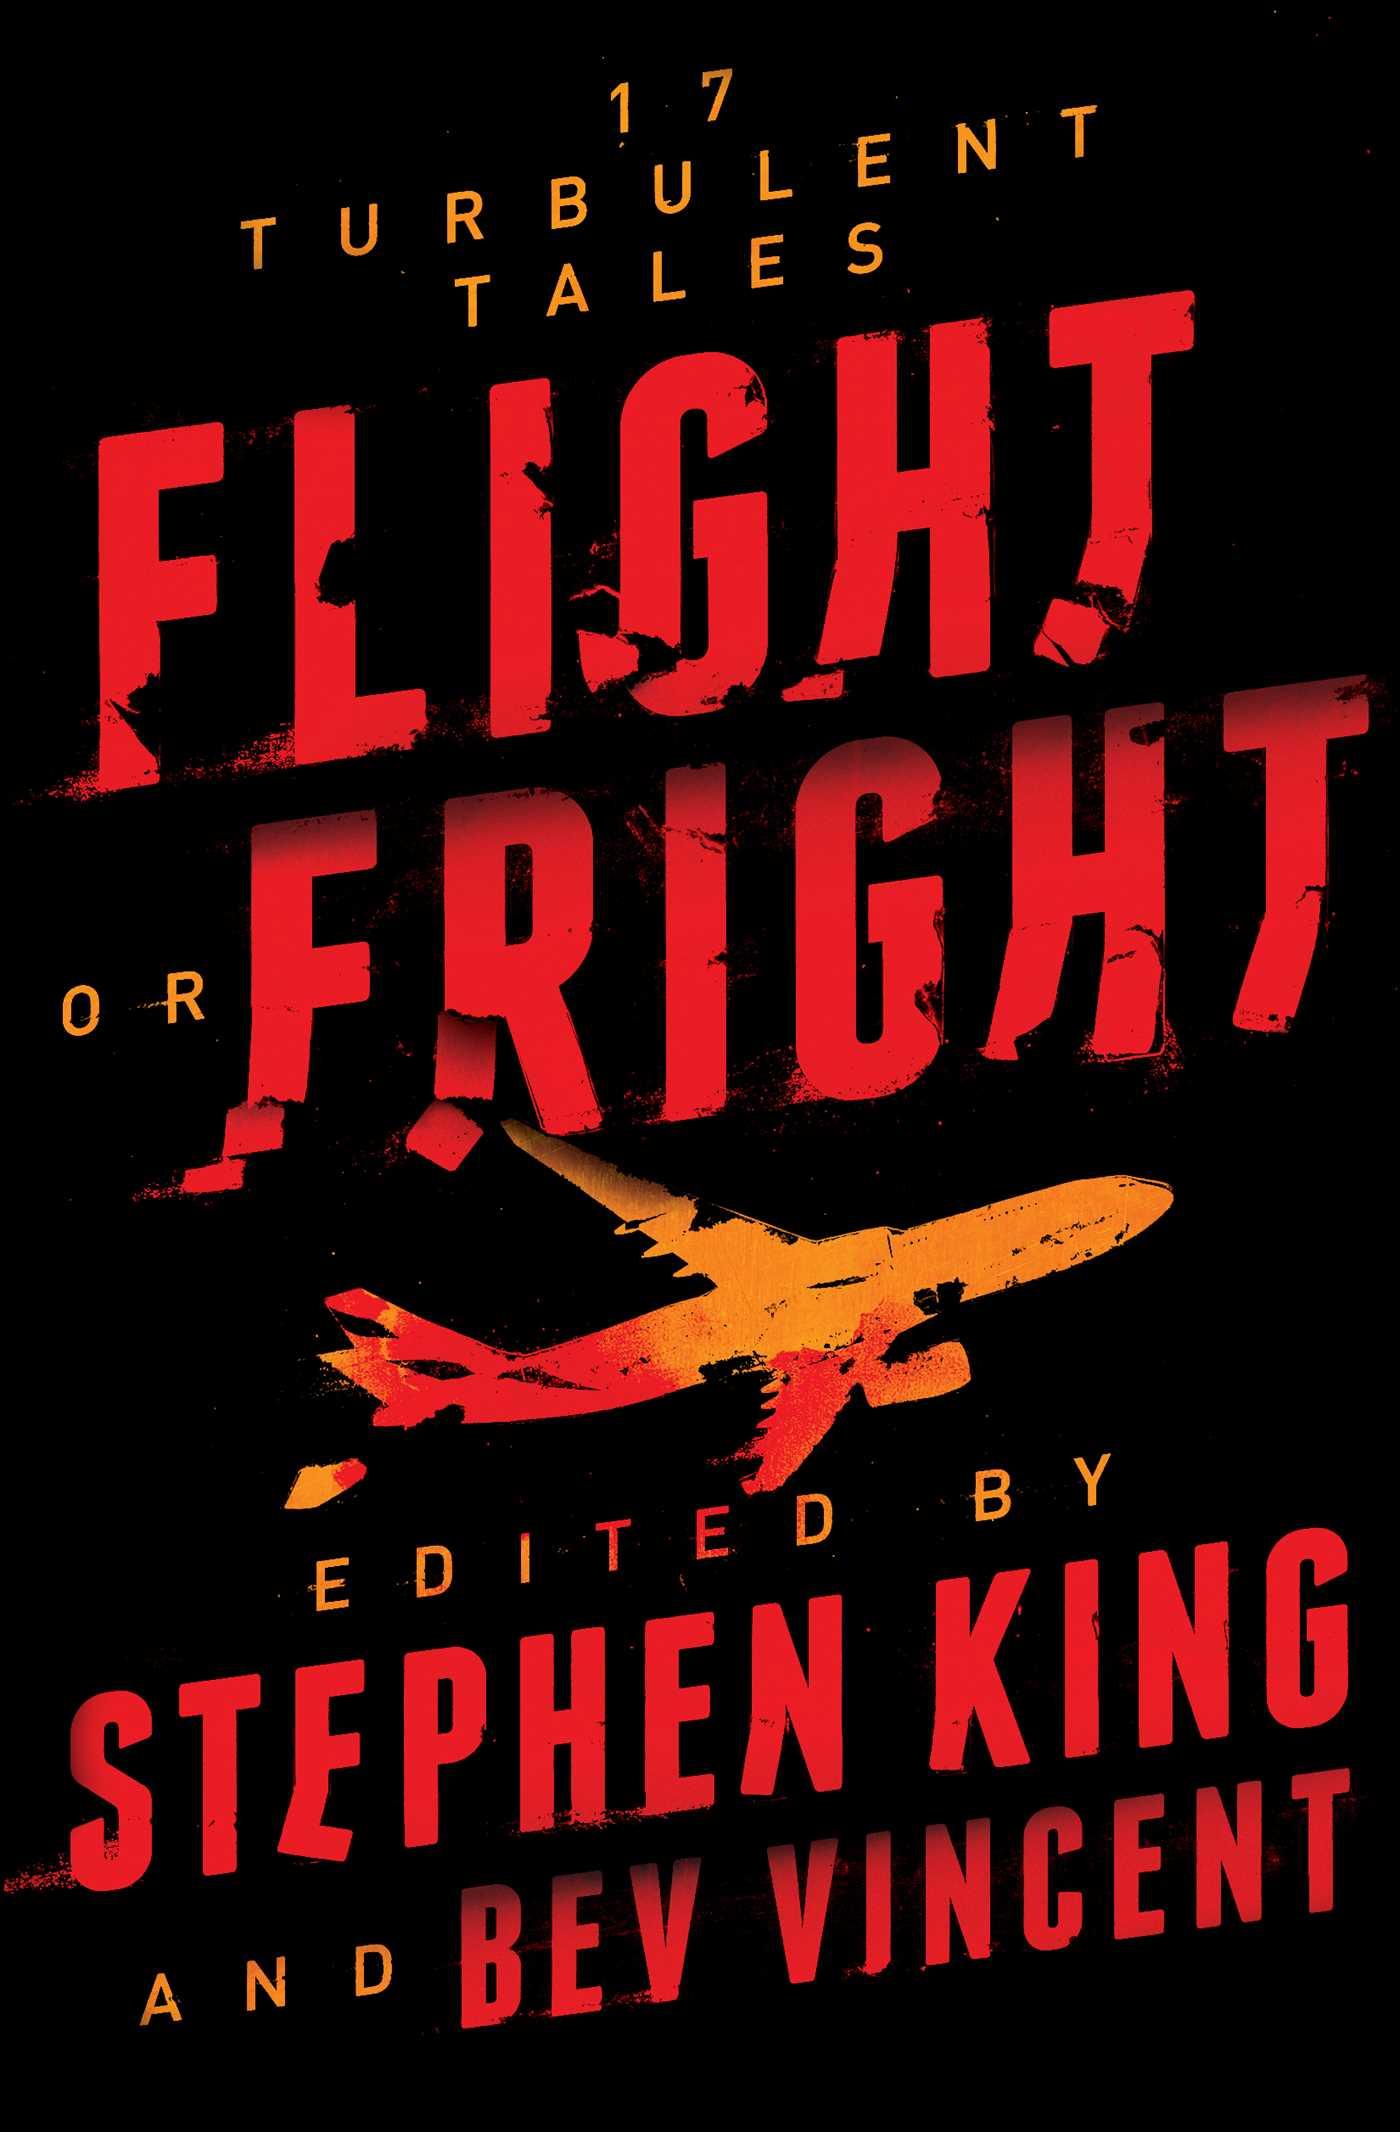 Flight or Fright | Book by Stephen King, Bev Vincent